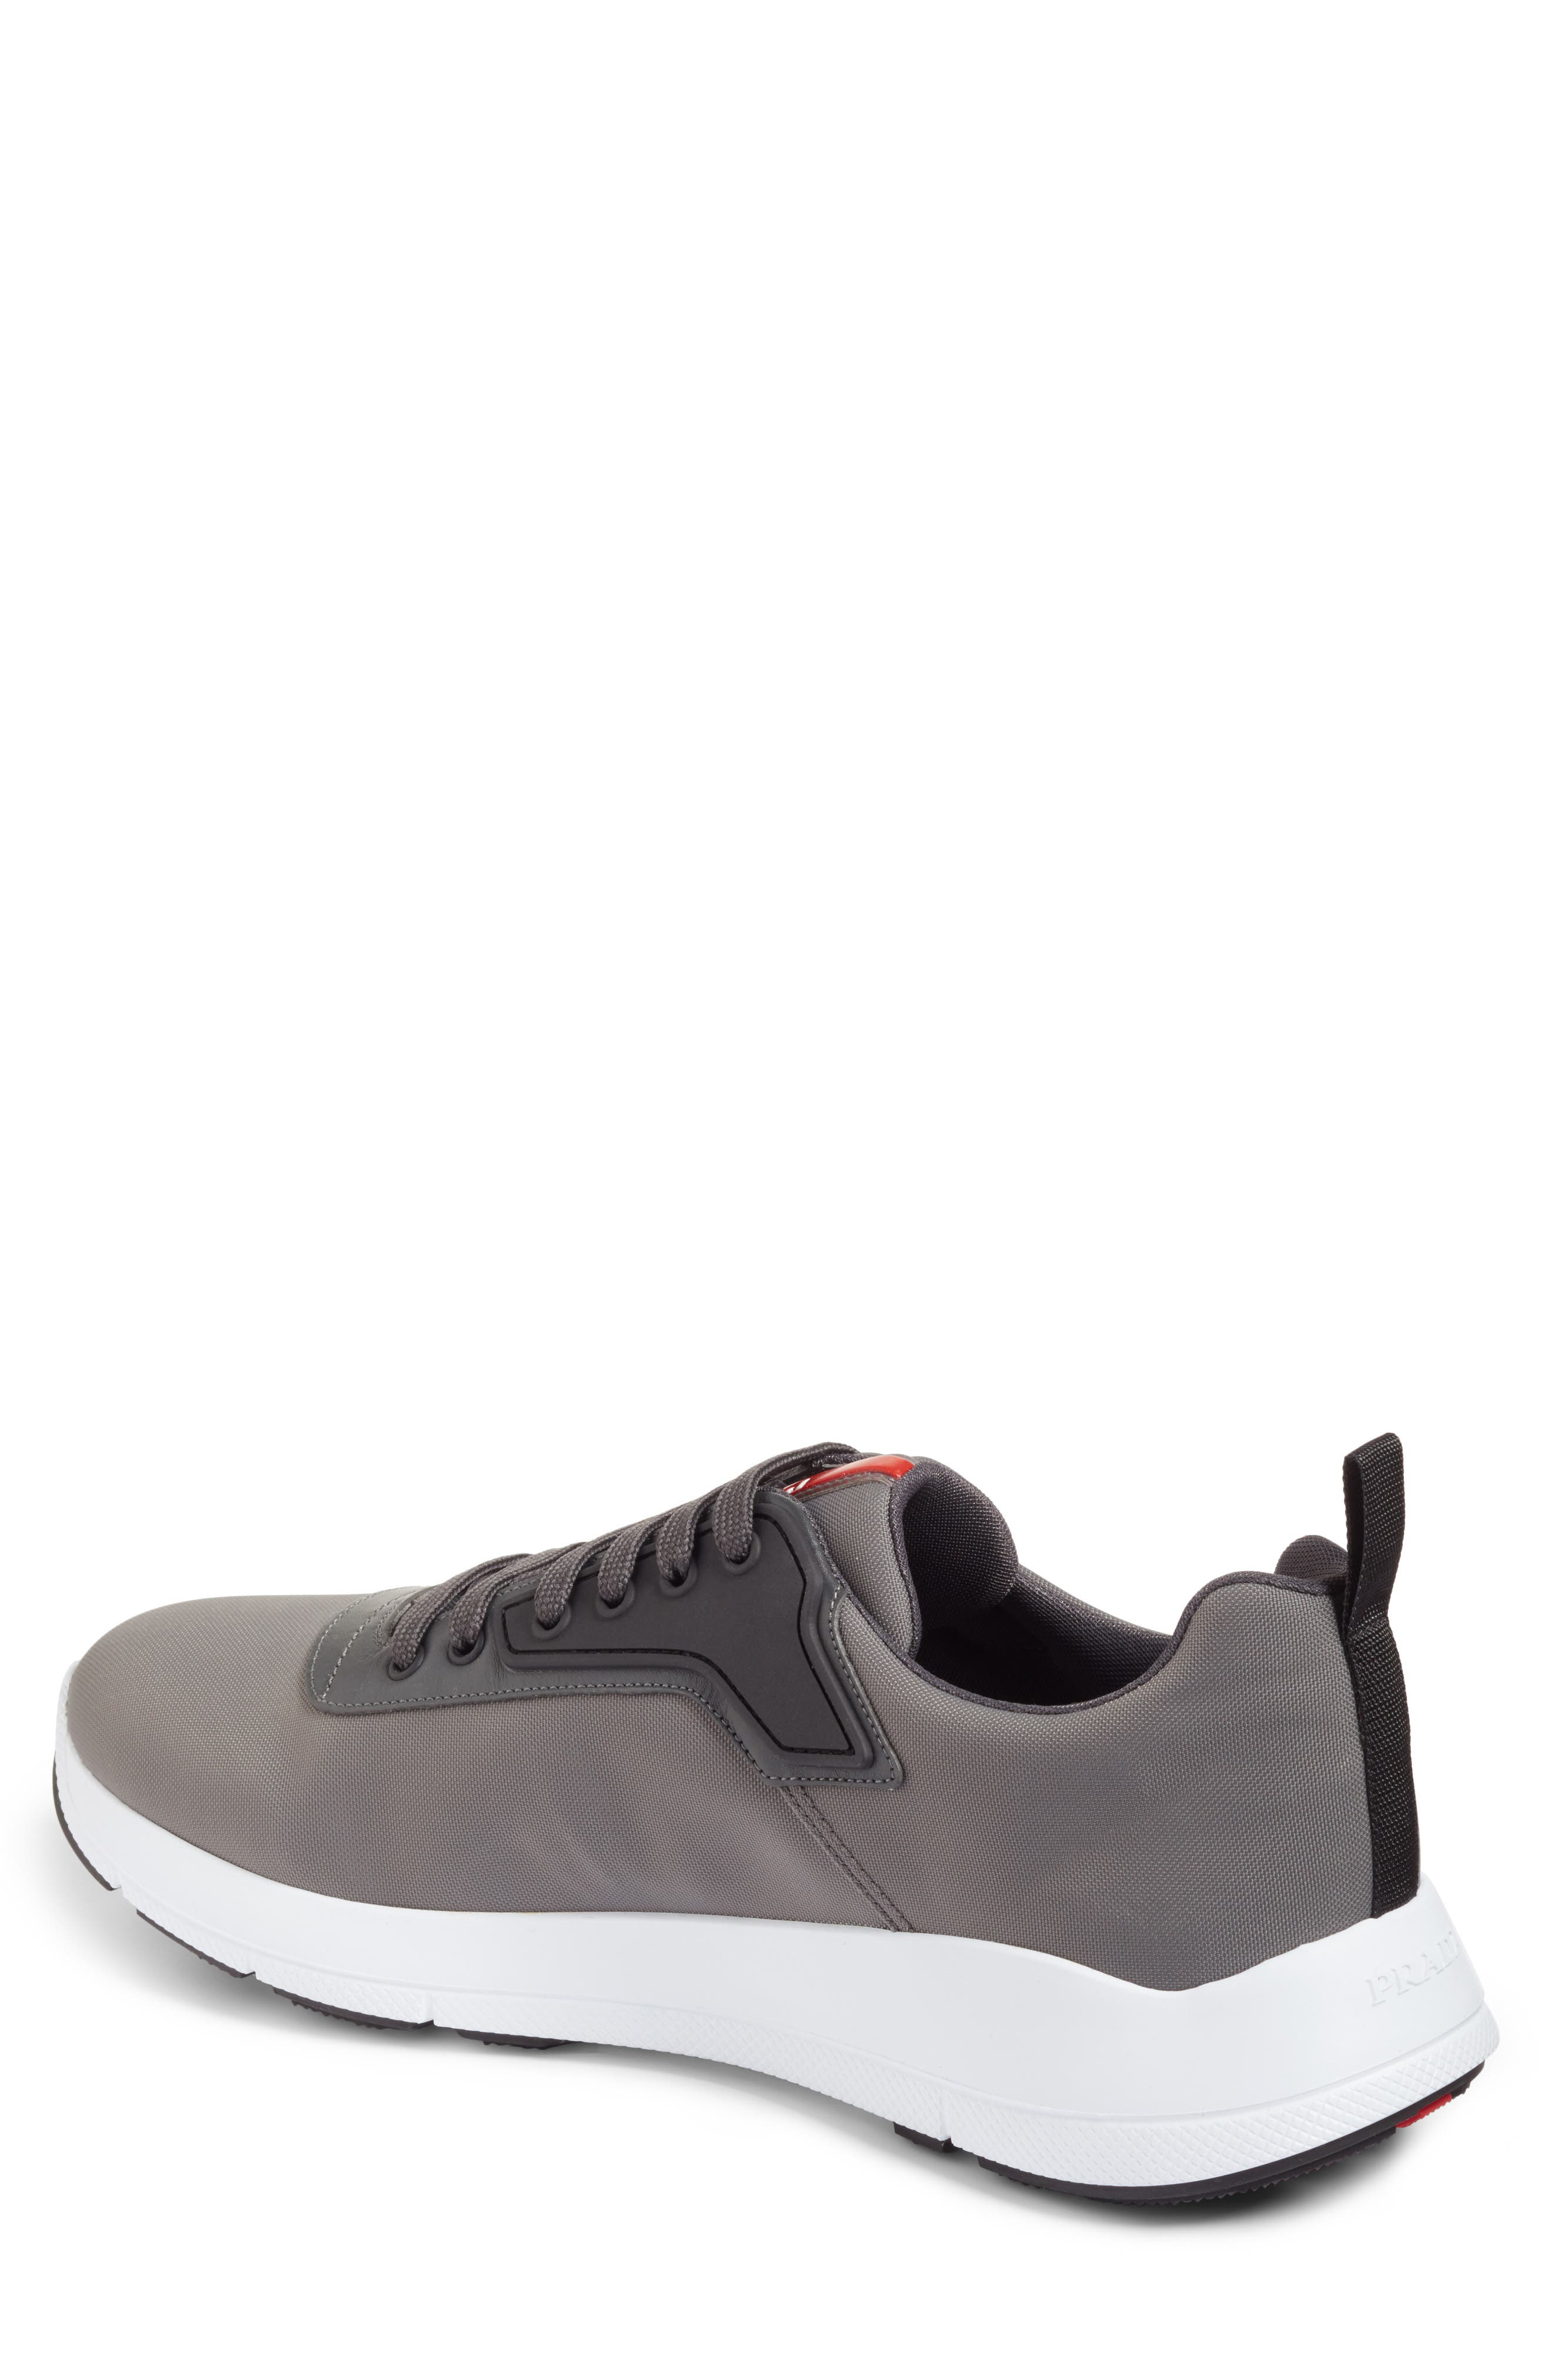 Linea Rossa Tech Sneaker,                             Alternate thumbnail 2, color,                             253